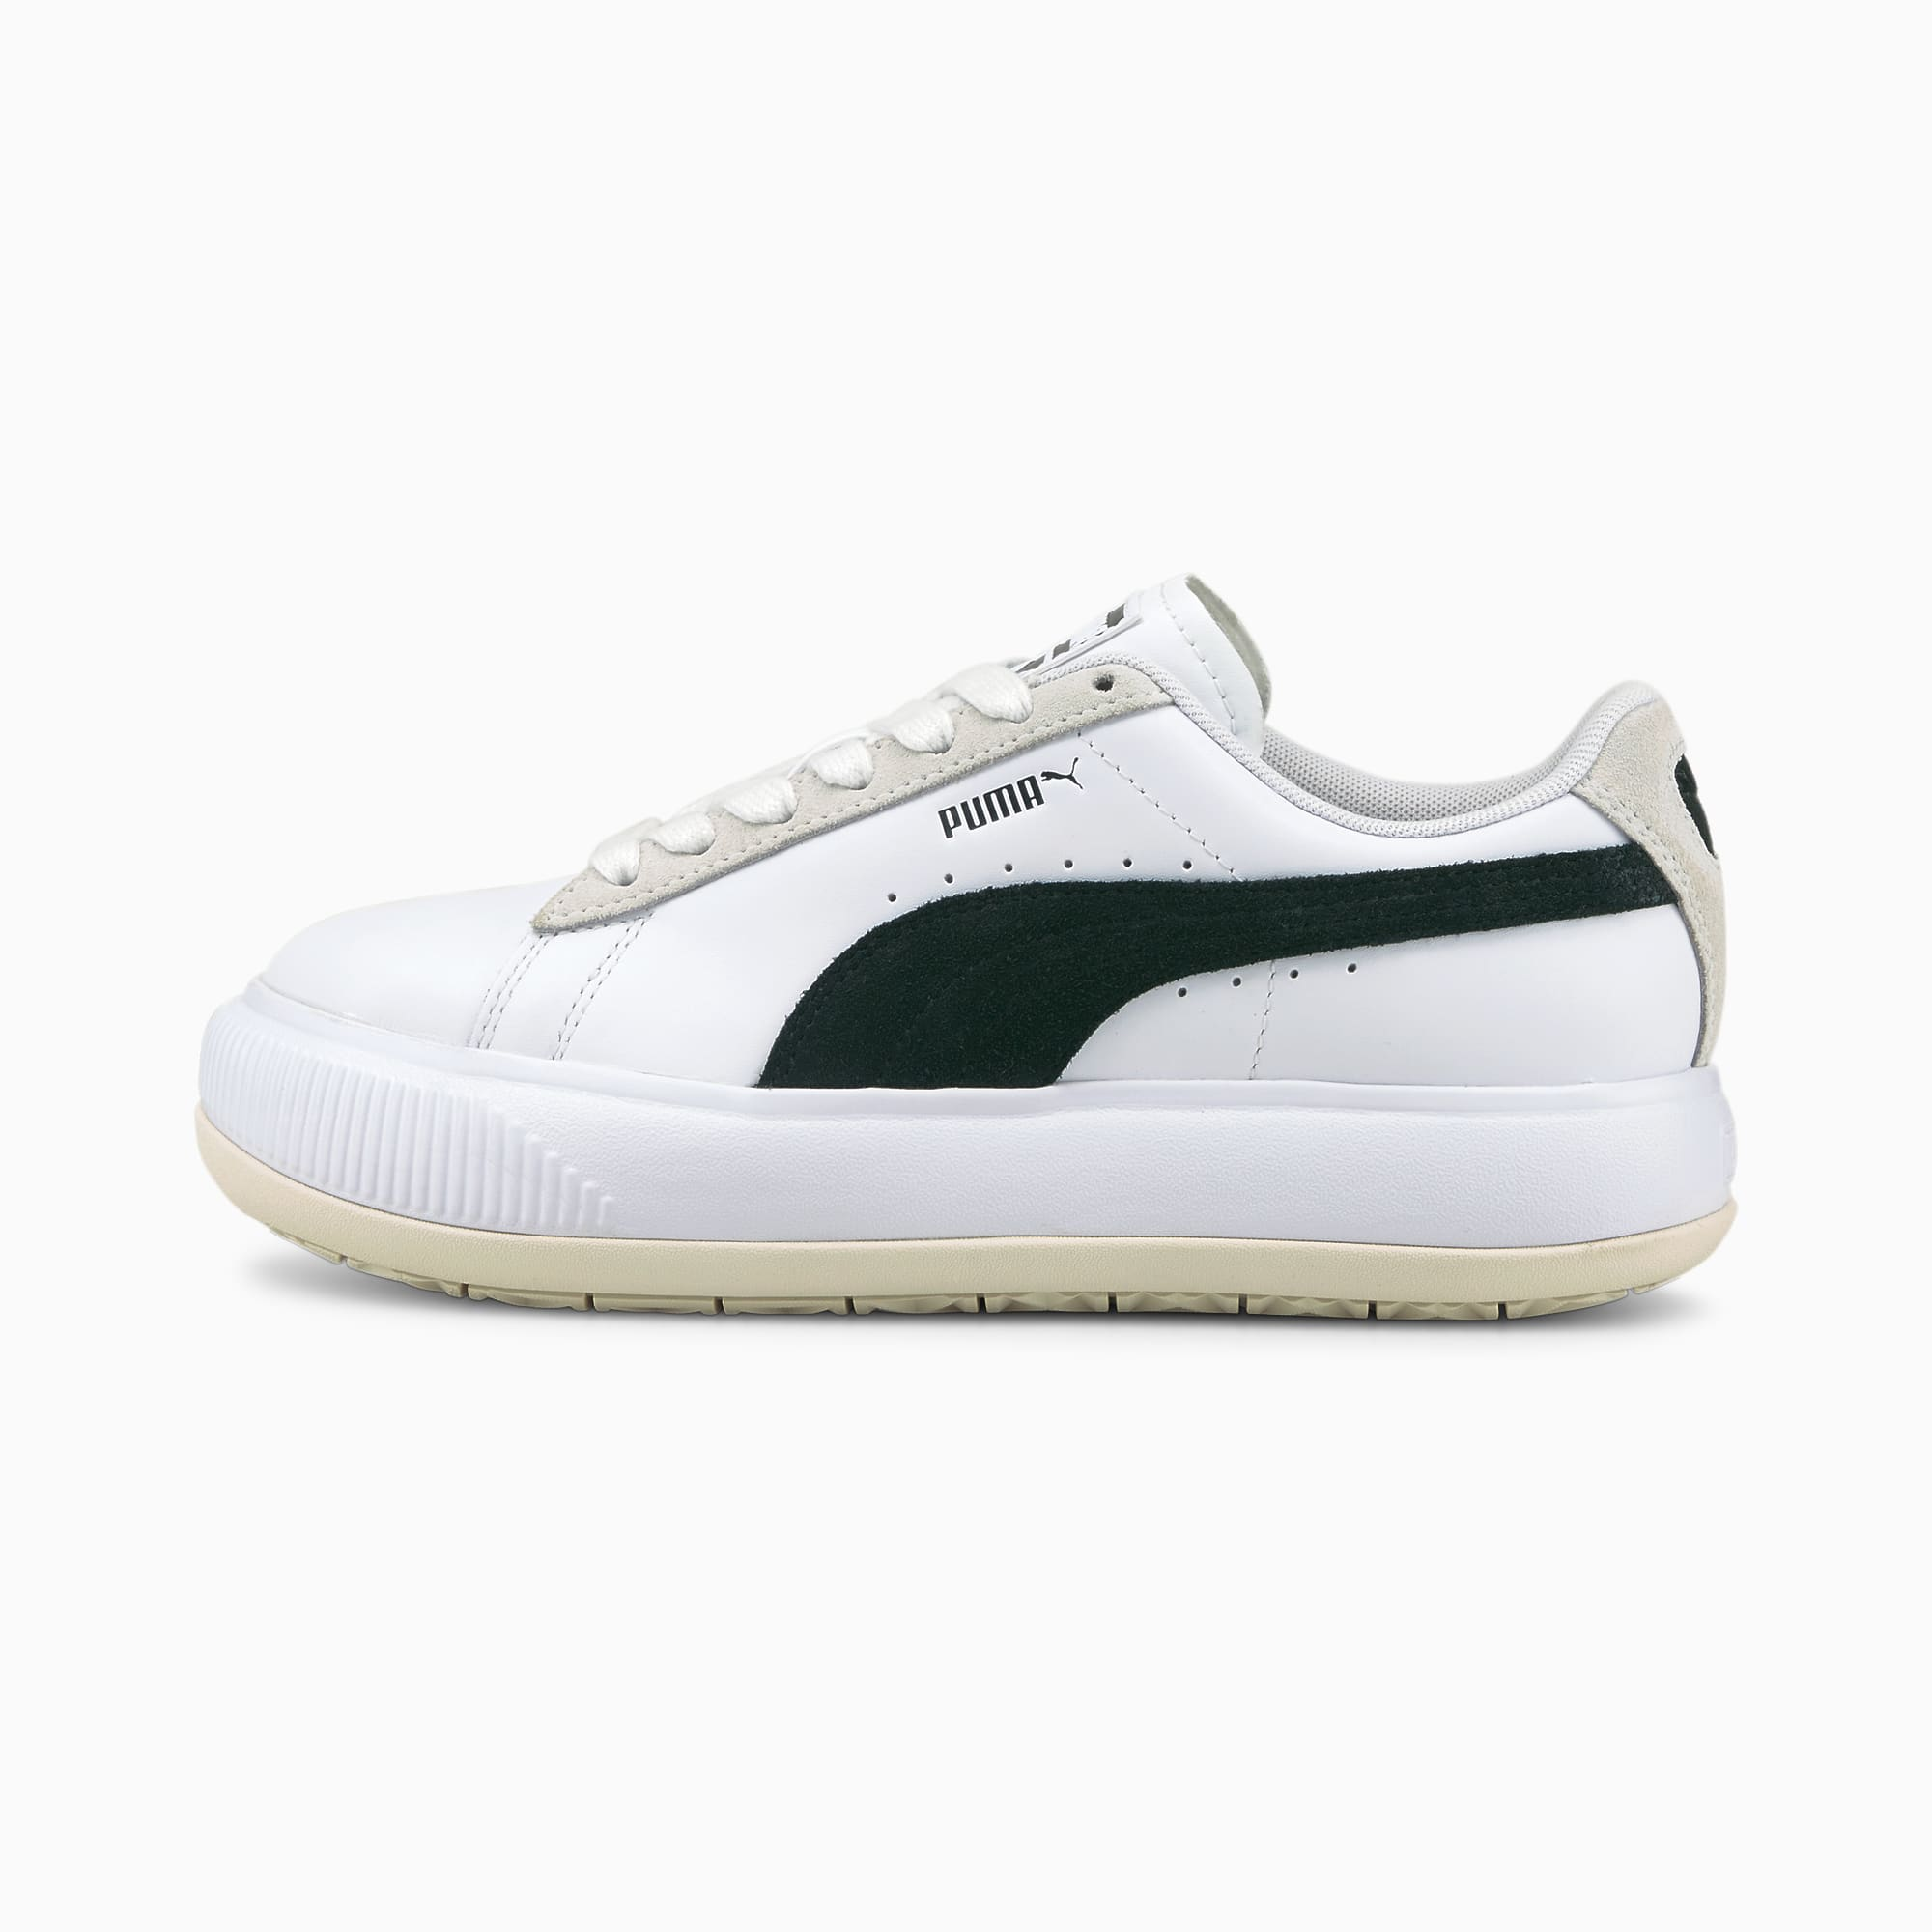 Suede Mayu Mix sneakers dames, Wit/Zwart, Maat 38,5   PUMA